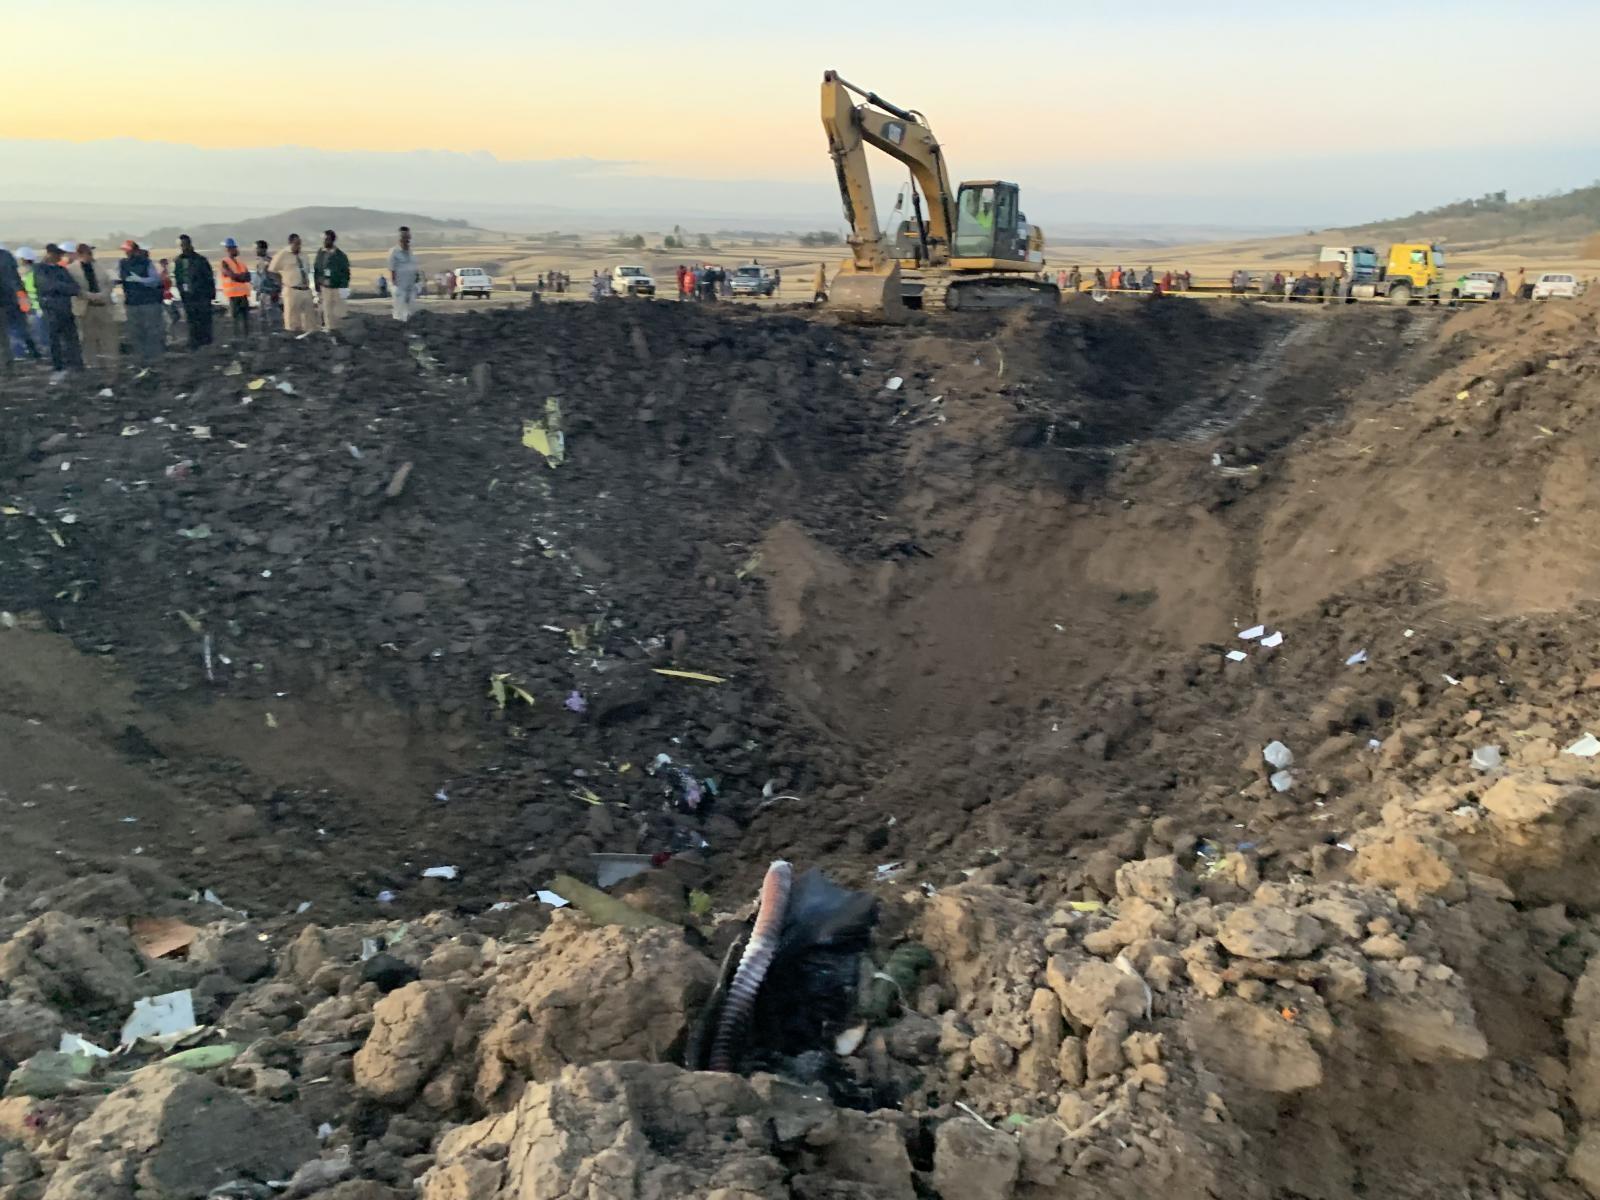 Kraj nesreče etiopskega boeinga 737 Vir:Pixsell